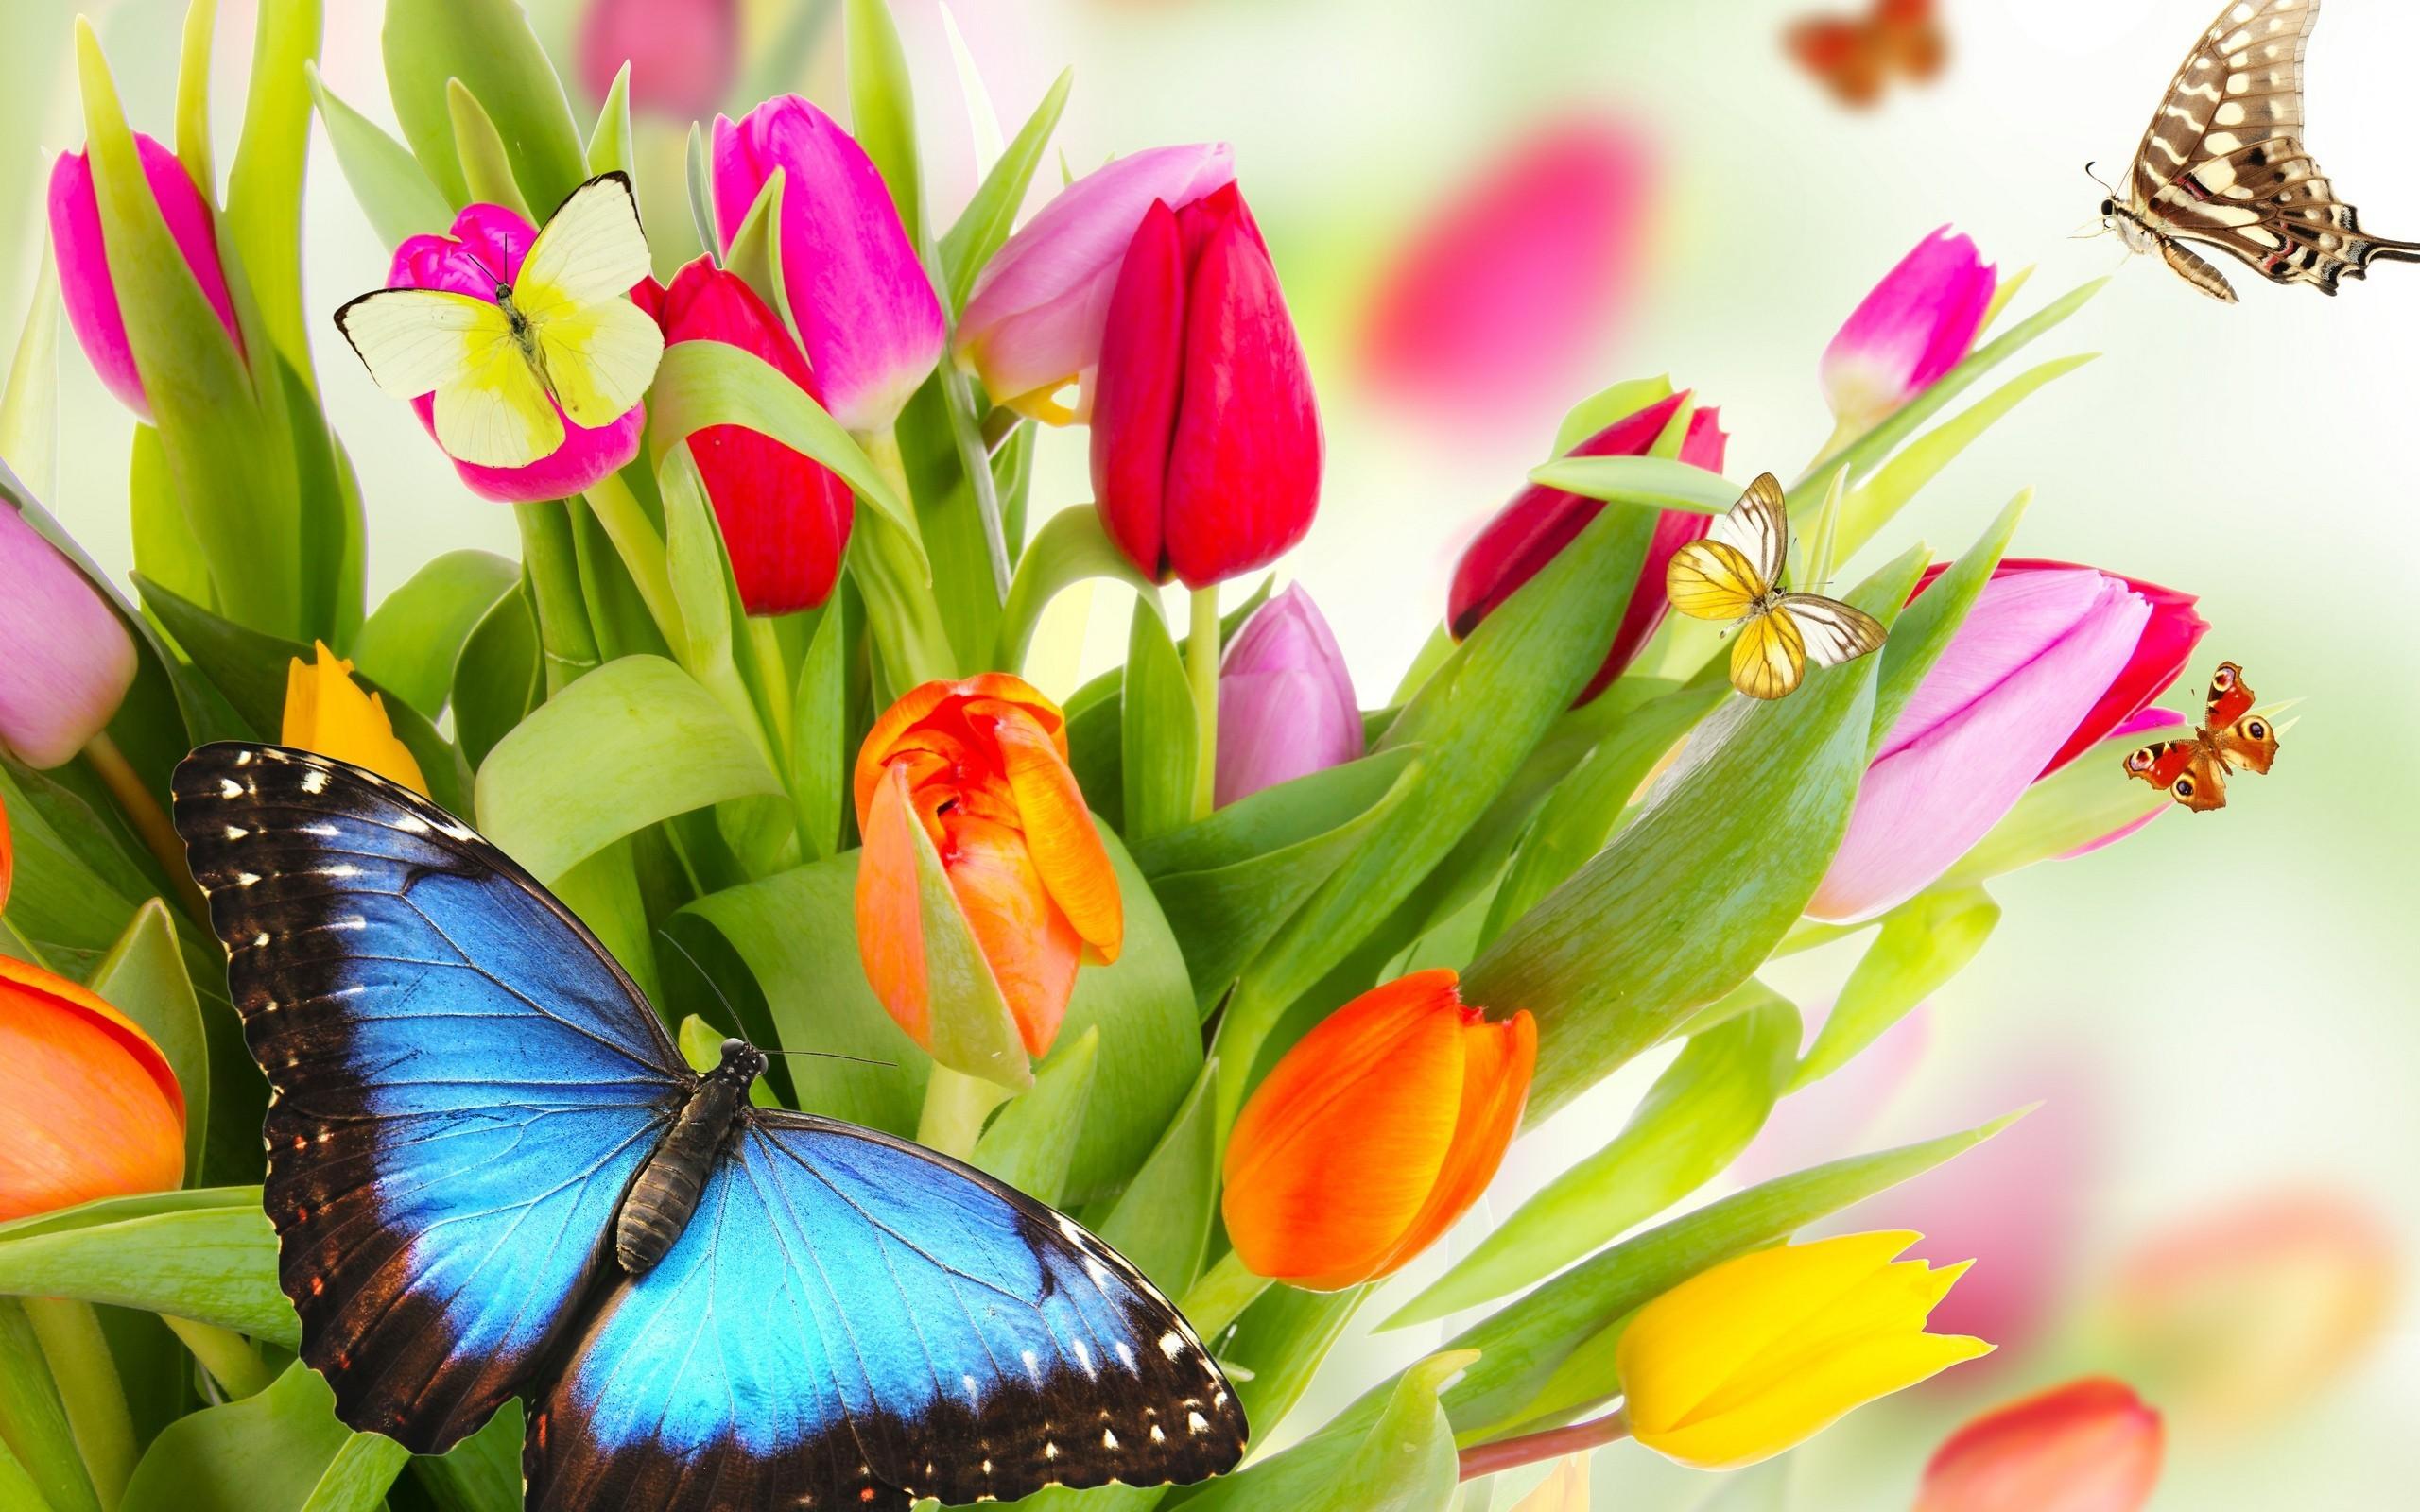 Flowers, beauty, butterflies wallpaper thumb